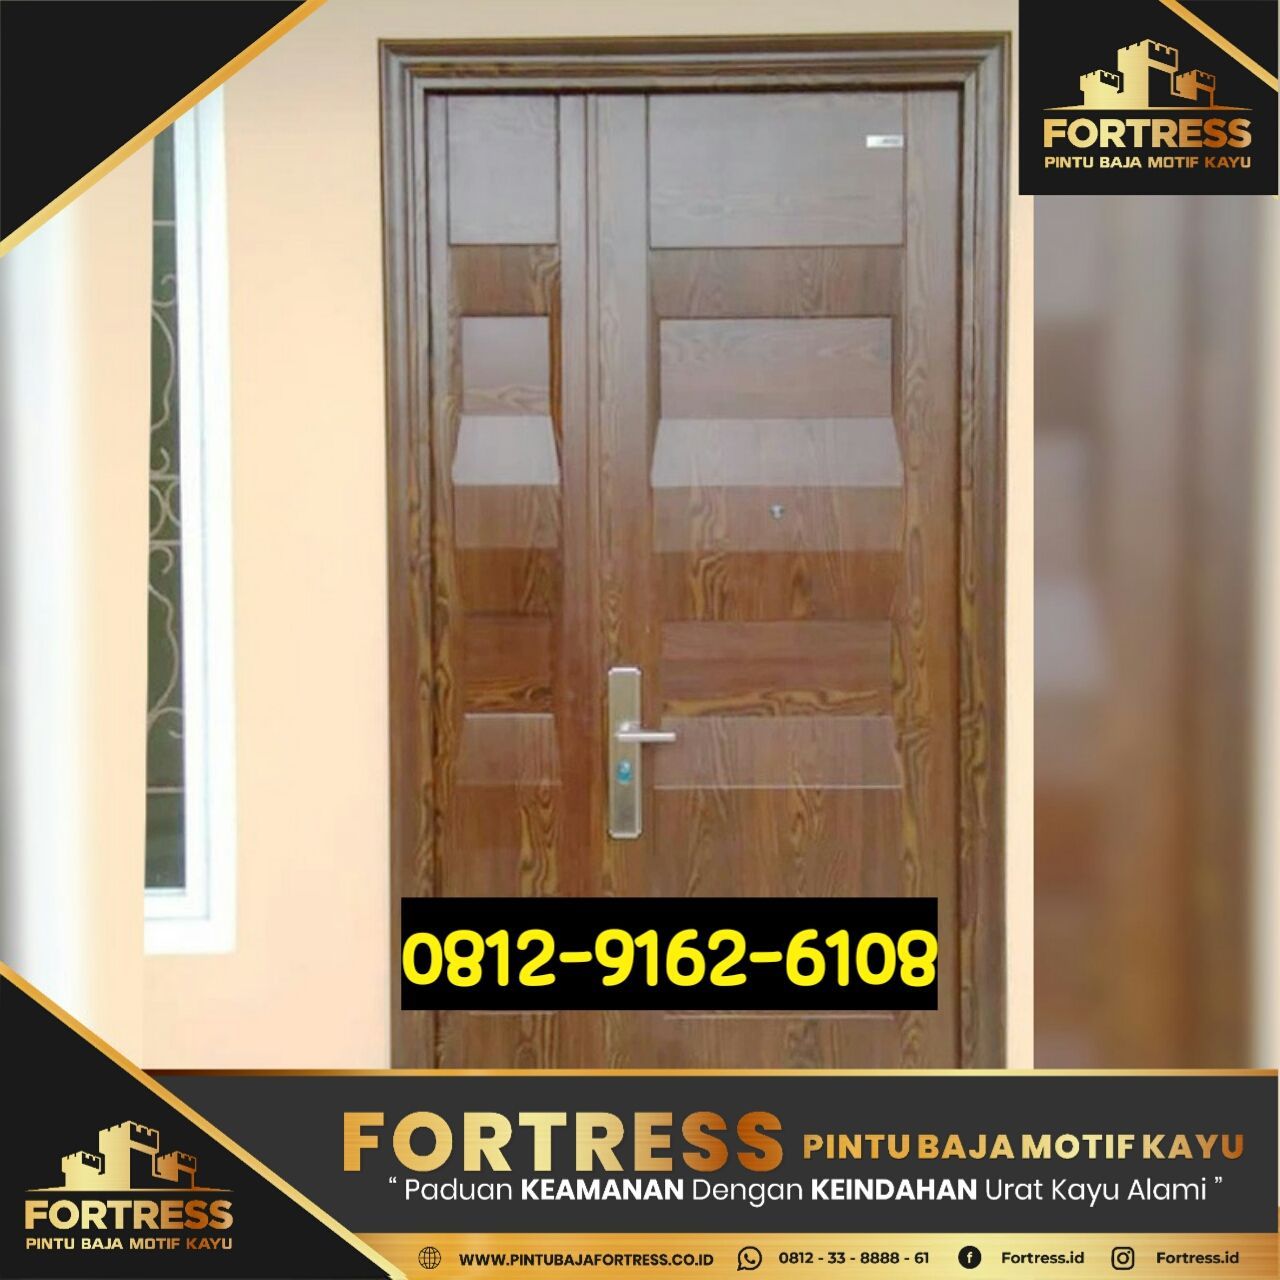 0812-9162-6105 (FOTRESS), the price of steel doors in Semarang, pint …